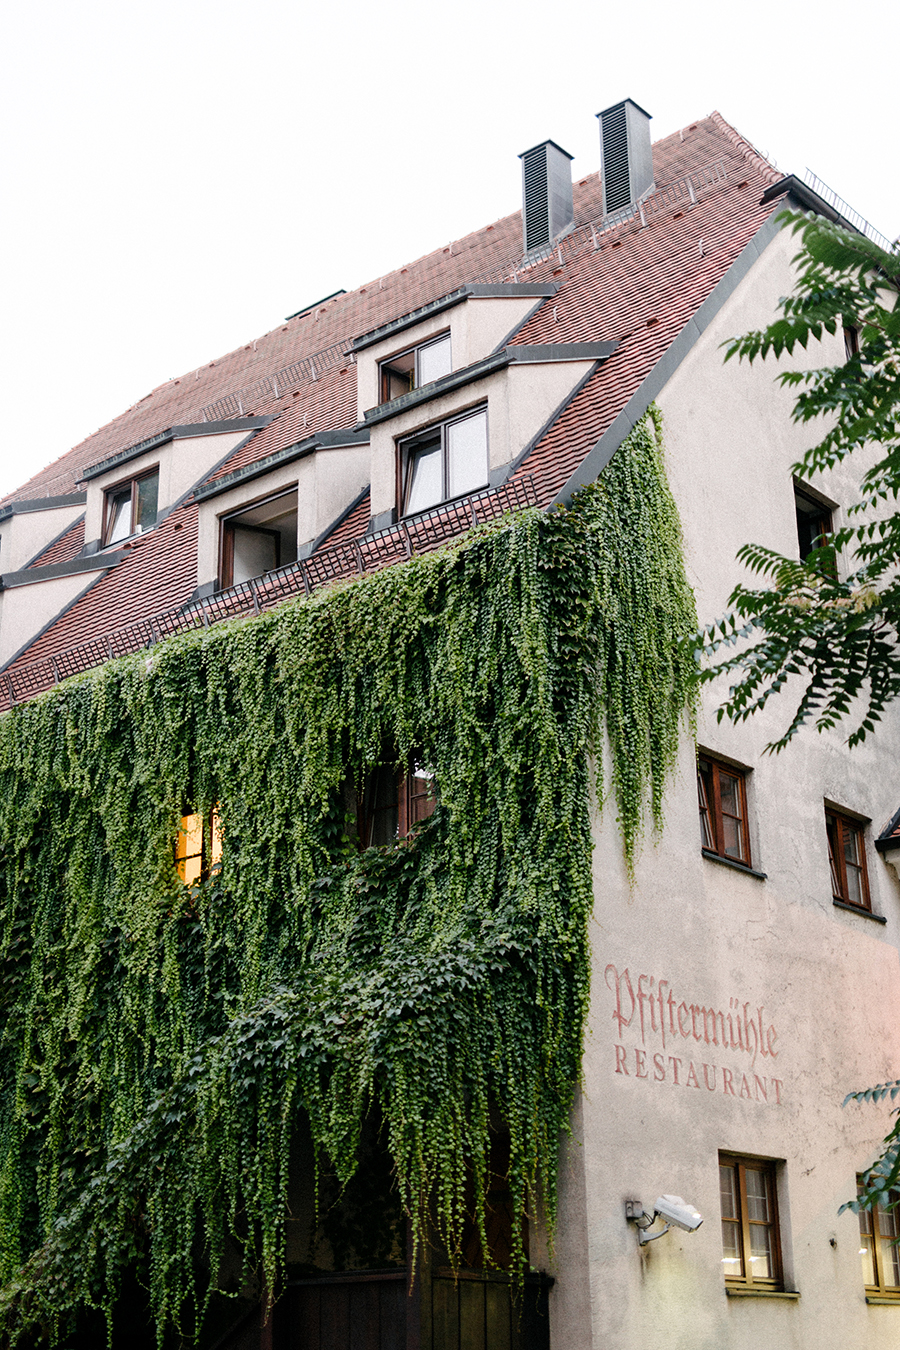 Munich, Munchen, Germany Travel Photography (1).jpg